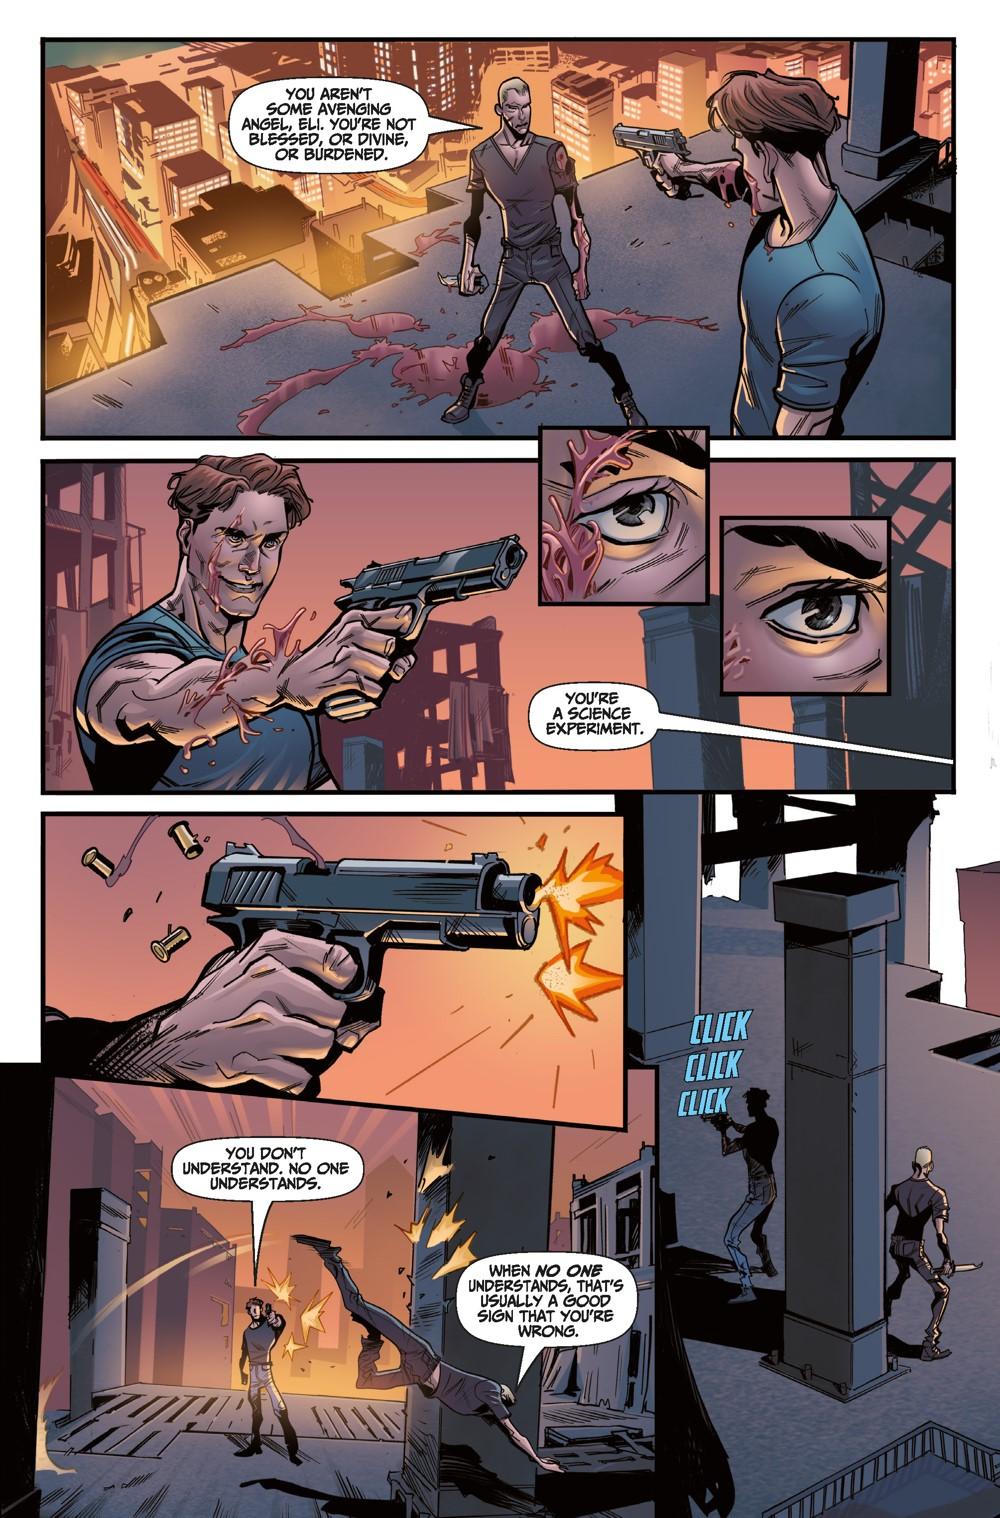 ExtraOrdinary1-_Page_1 ComicList Previews: EXTRAORDINARY #1